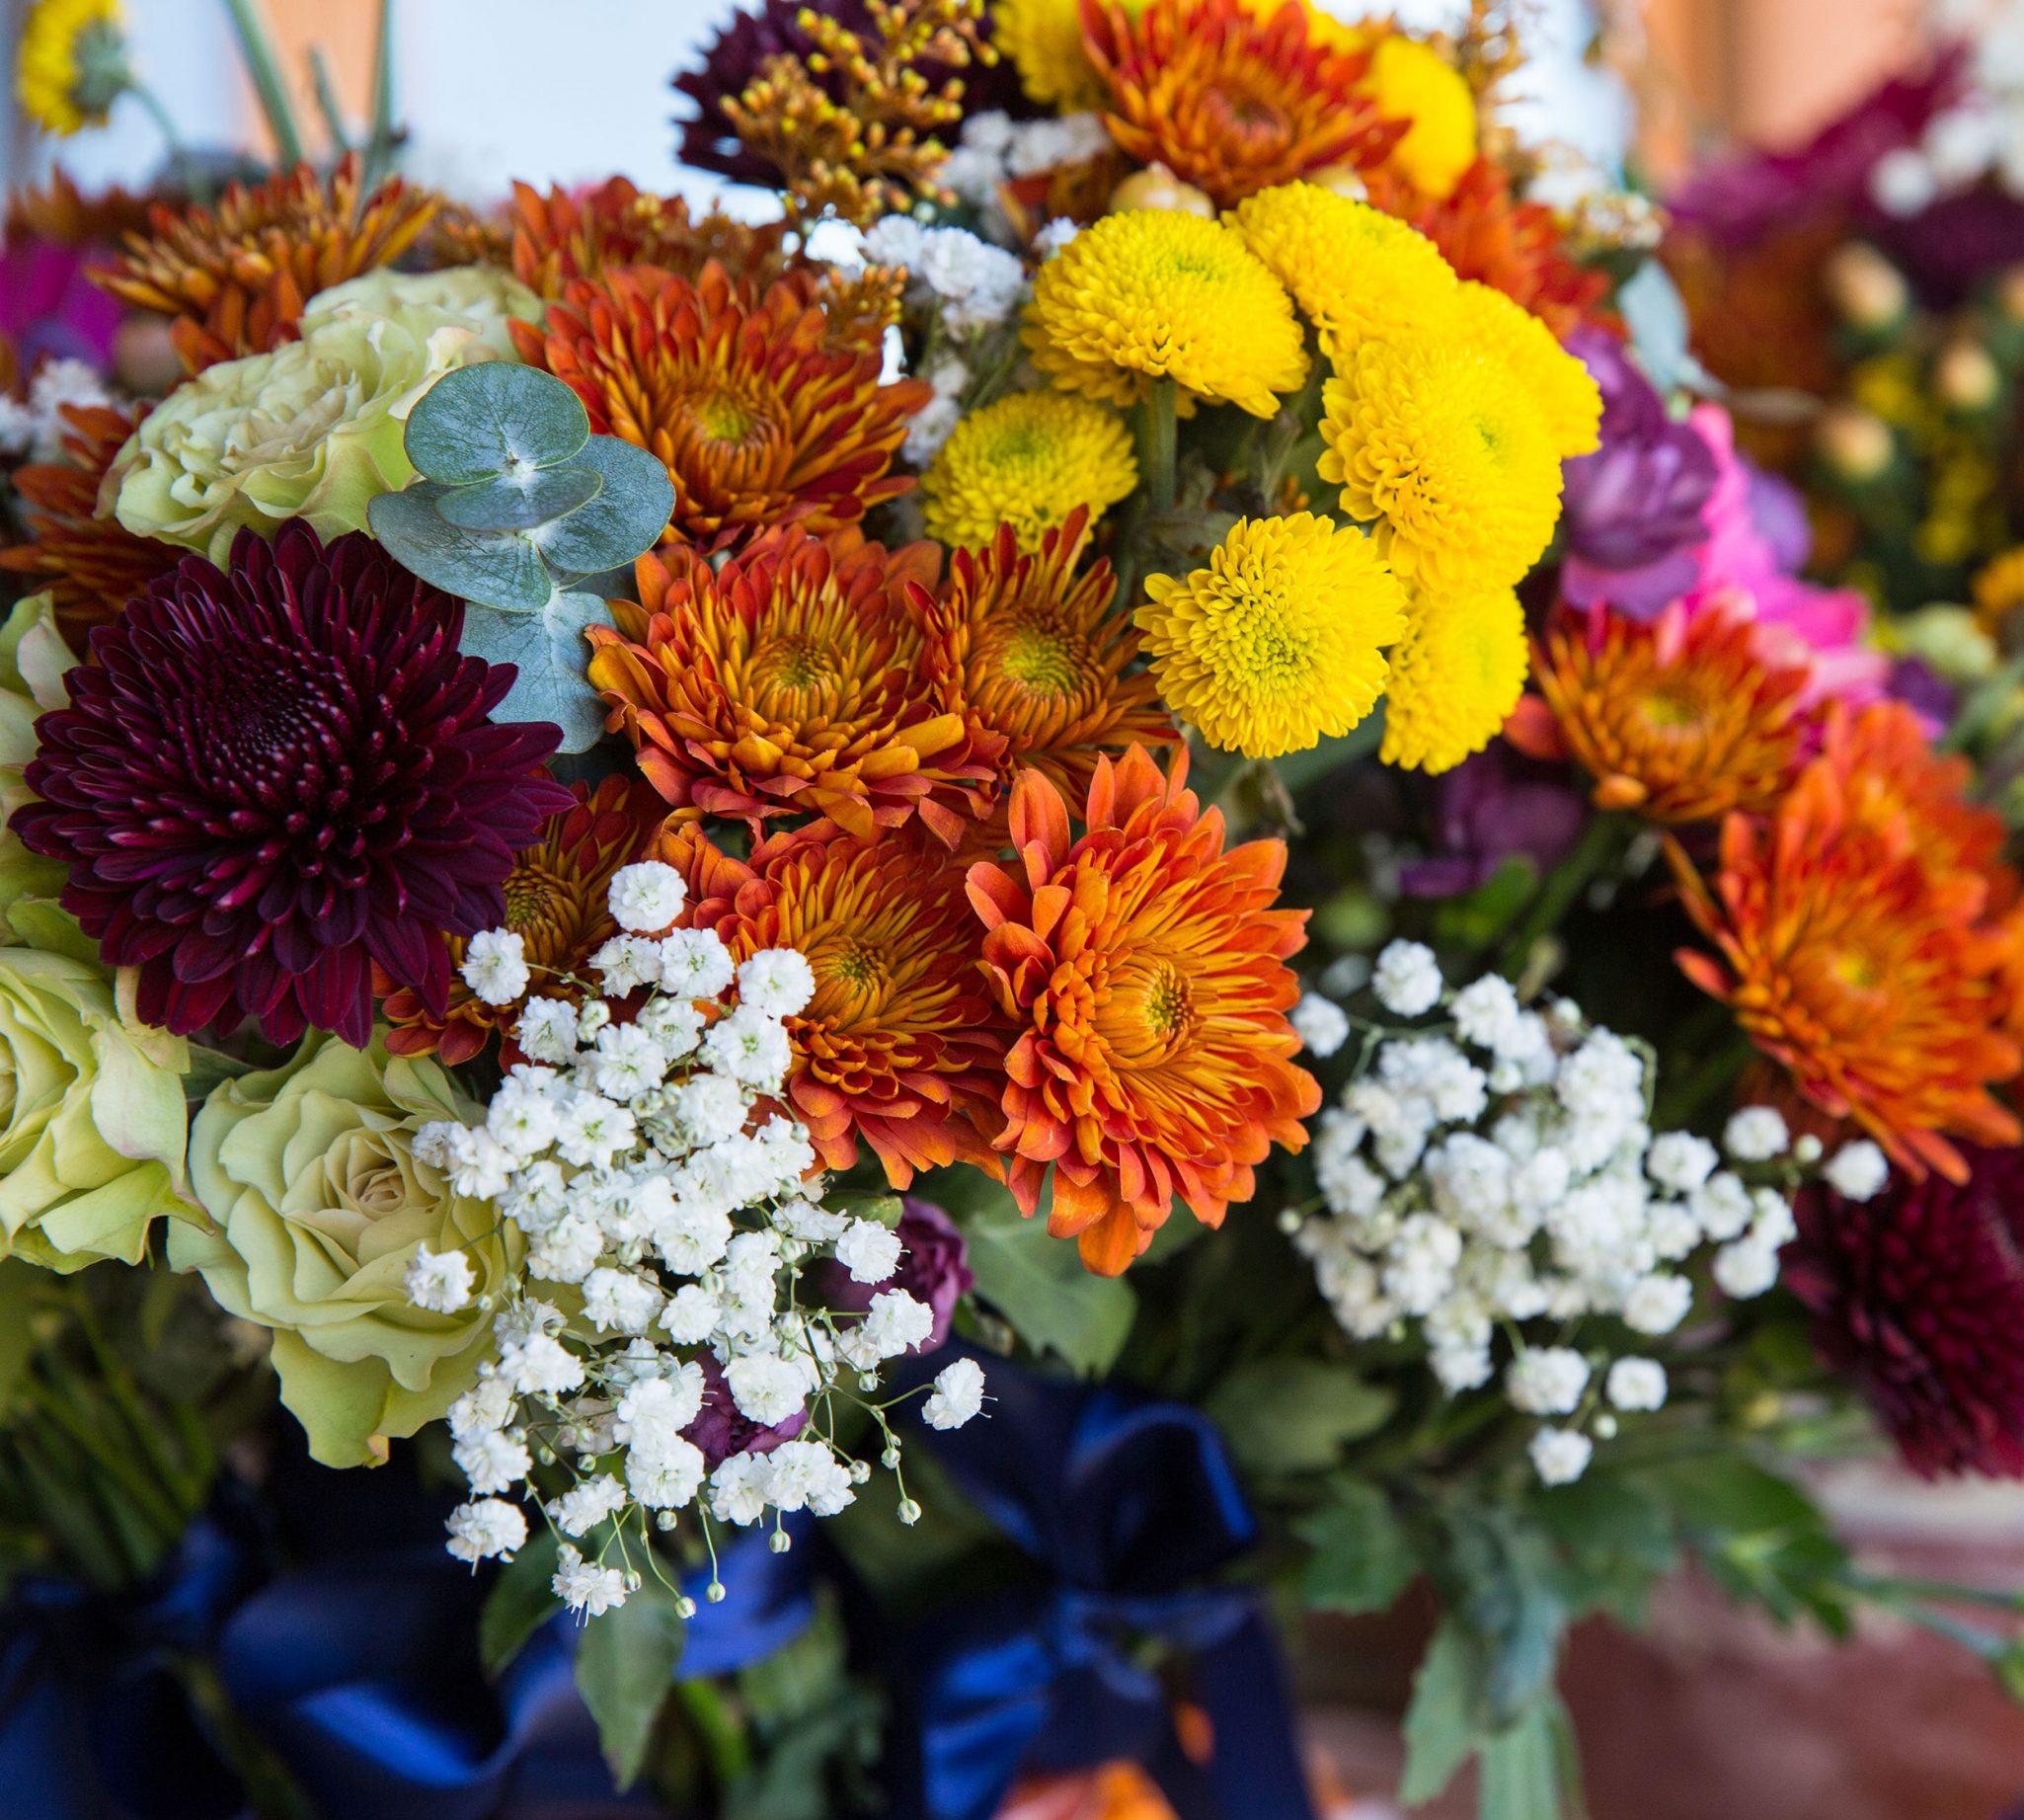 Flowers at Ridegwood Event Center, Durango Colorado